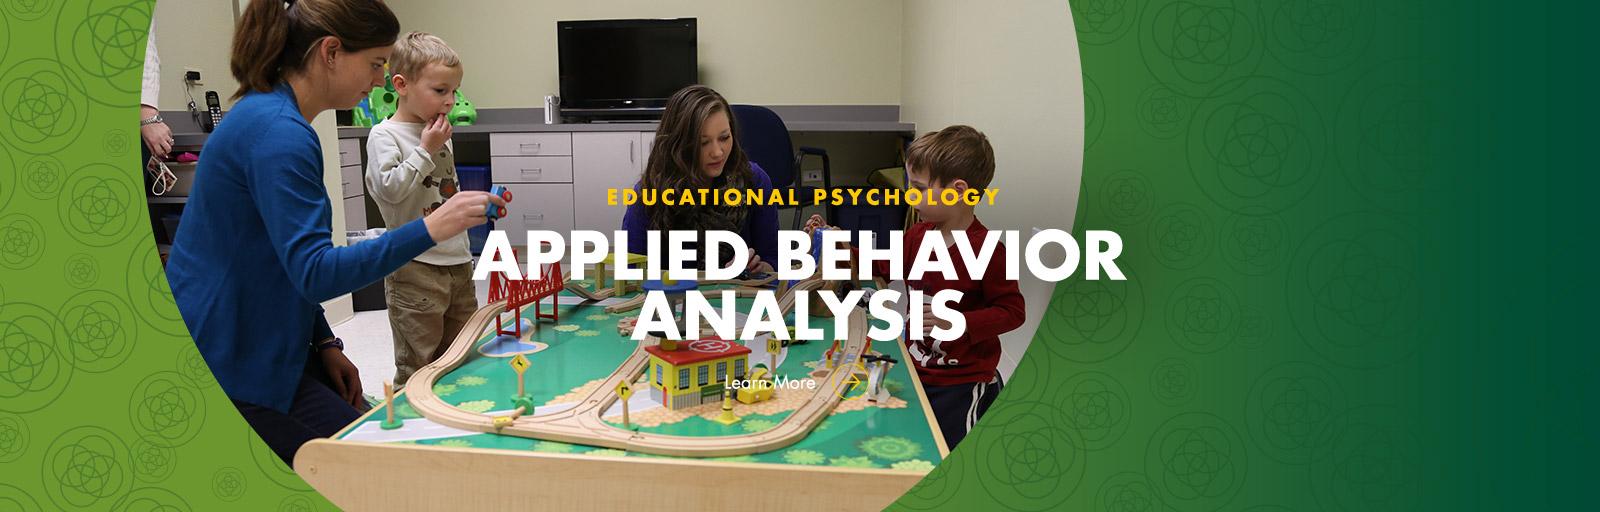 soe-mc_edp-Applied-Behavior